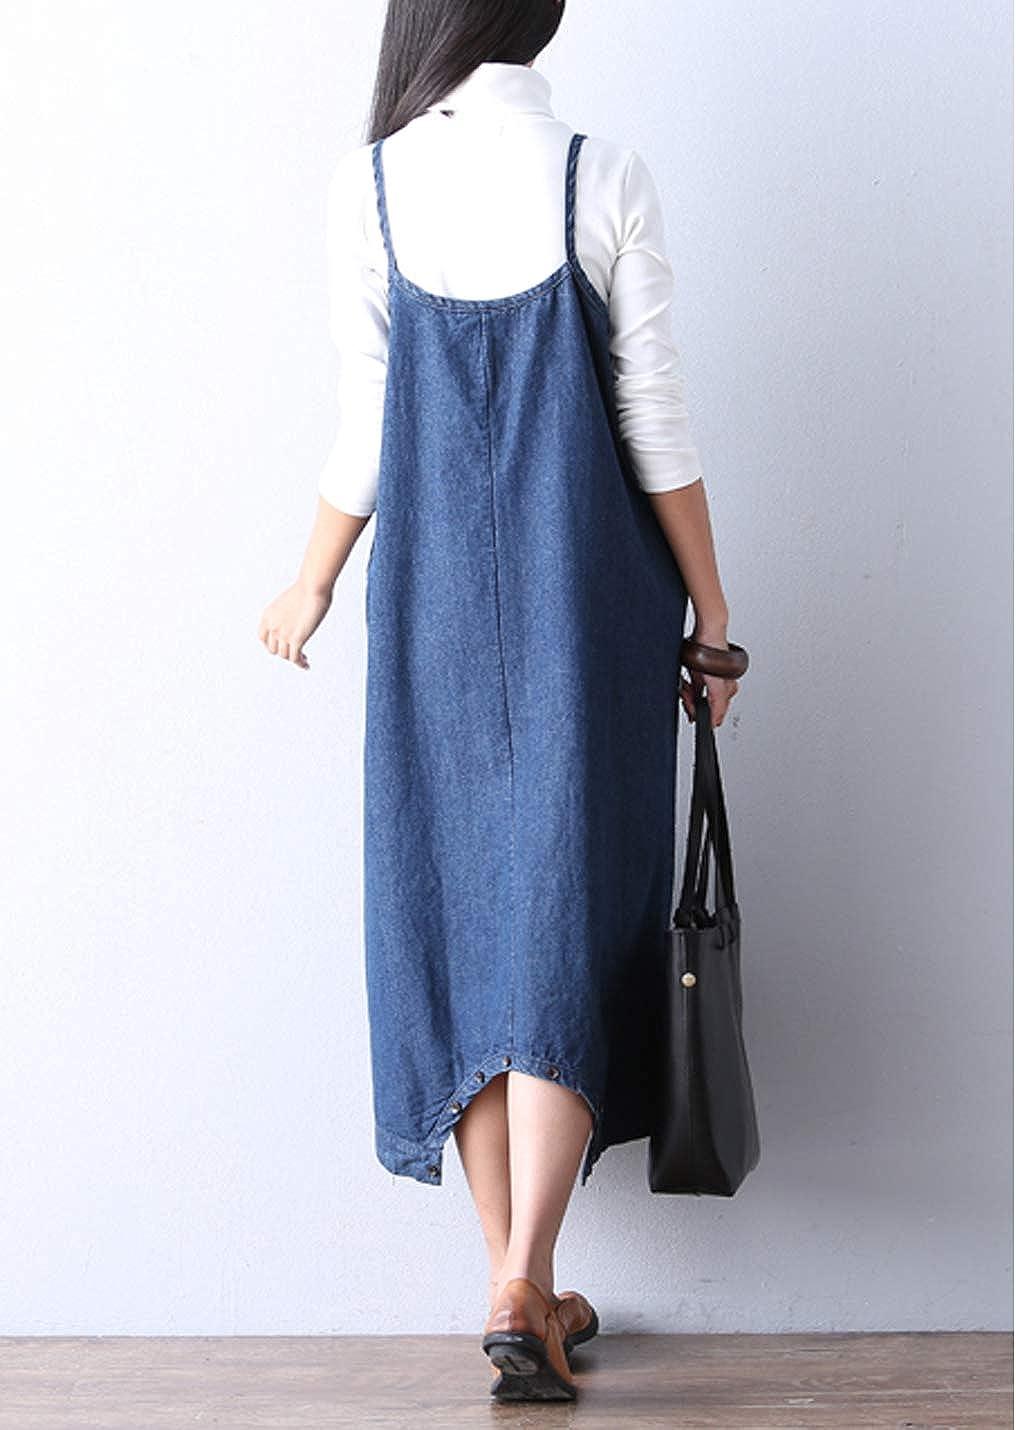 Naliha Women Denim Jumpsuits Baggy Summer Jeans Spaghetti Strap Rompers Maxi Dress